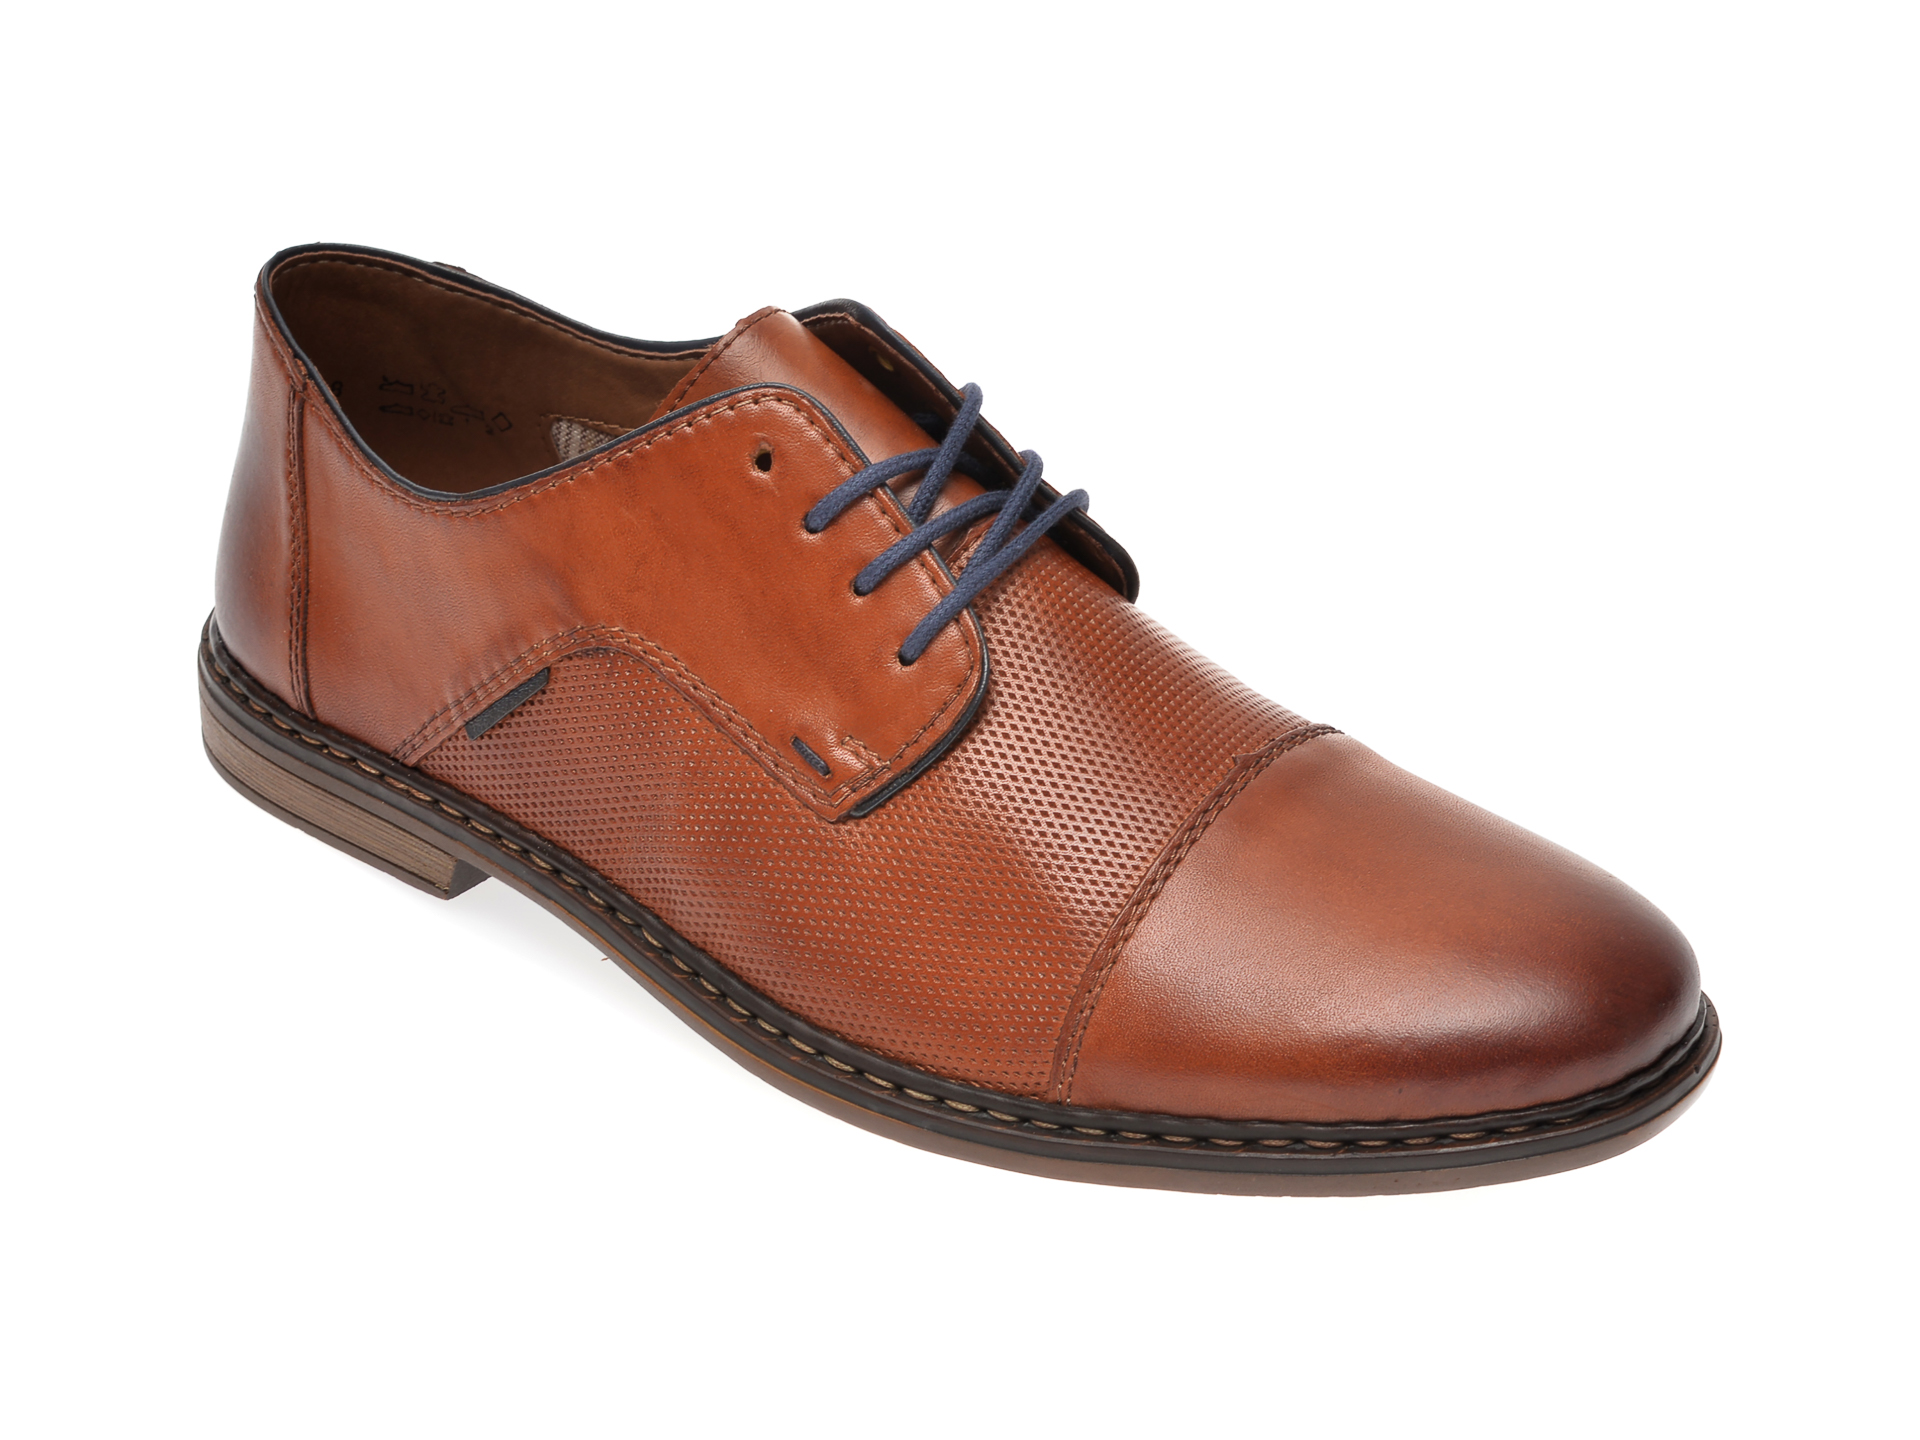 Pantofi Rieker Maro, 13409, Din Piele Naturala